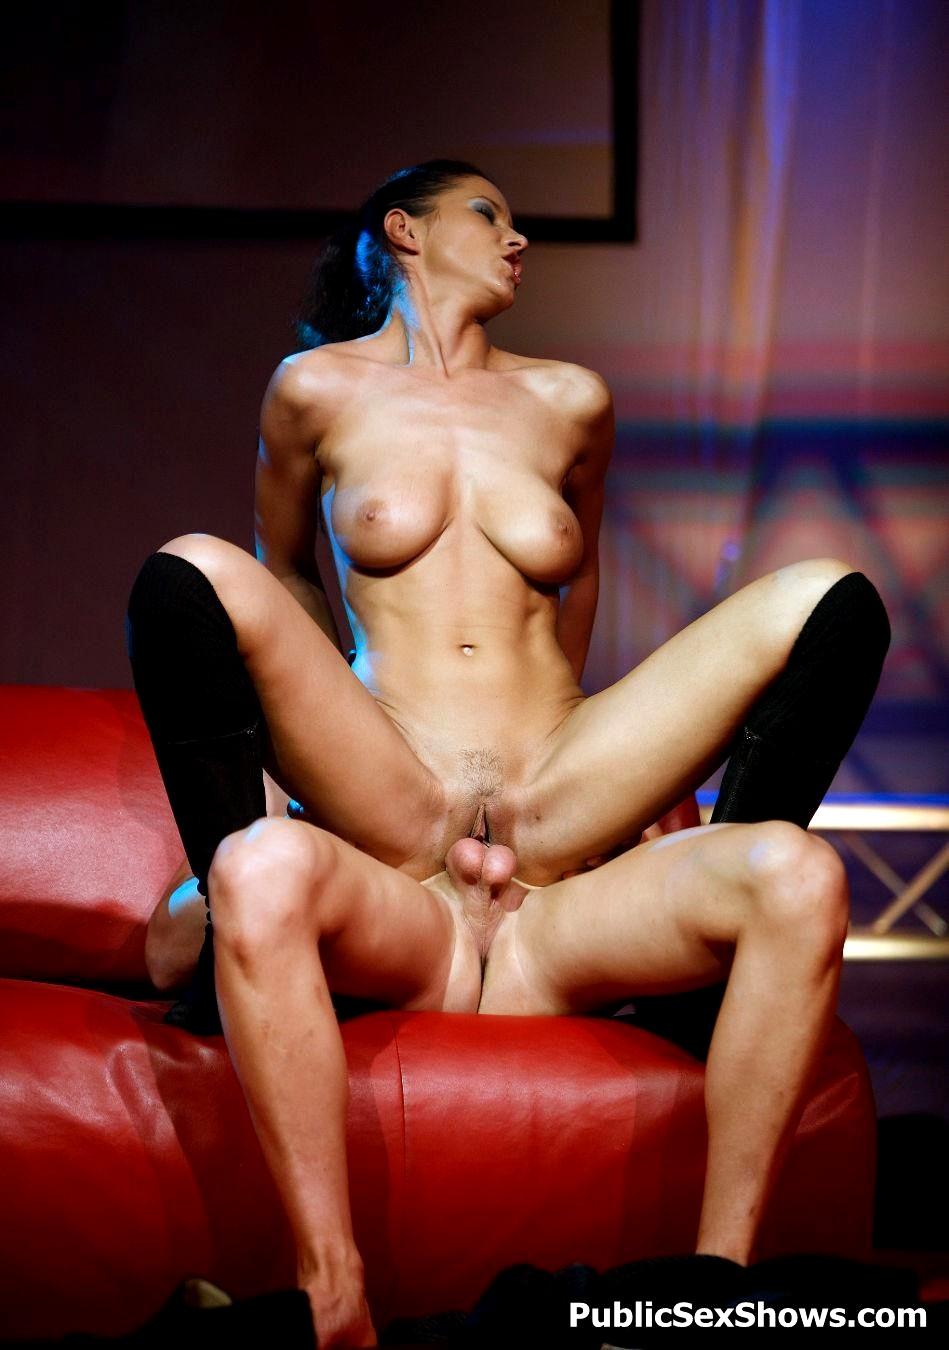 Hot Live Sex Show